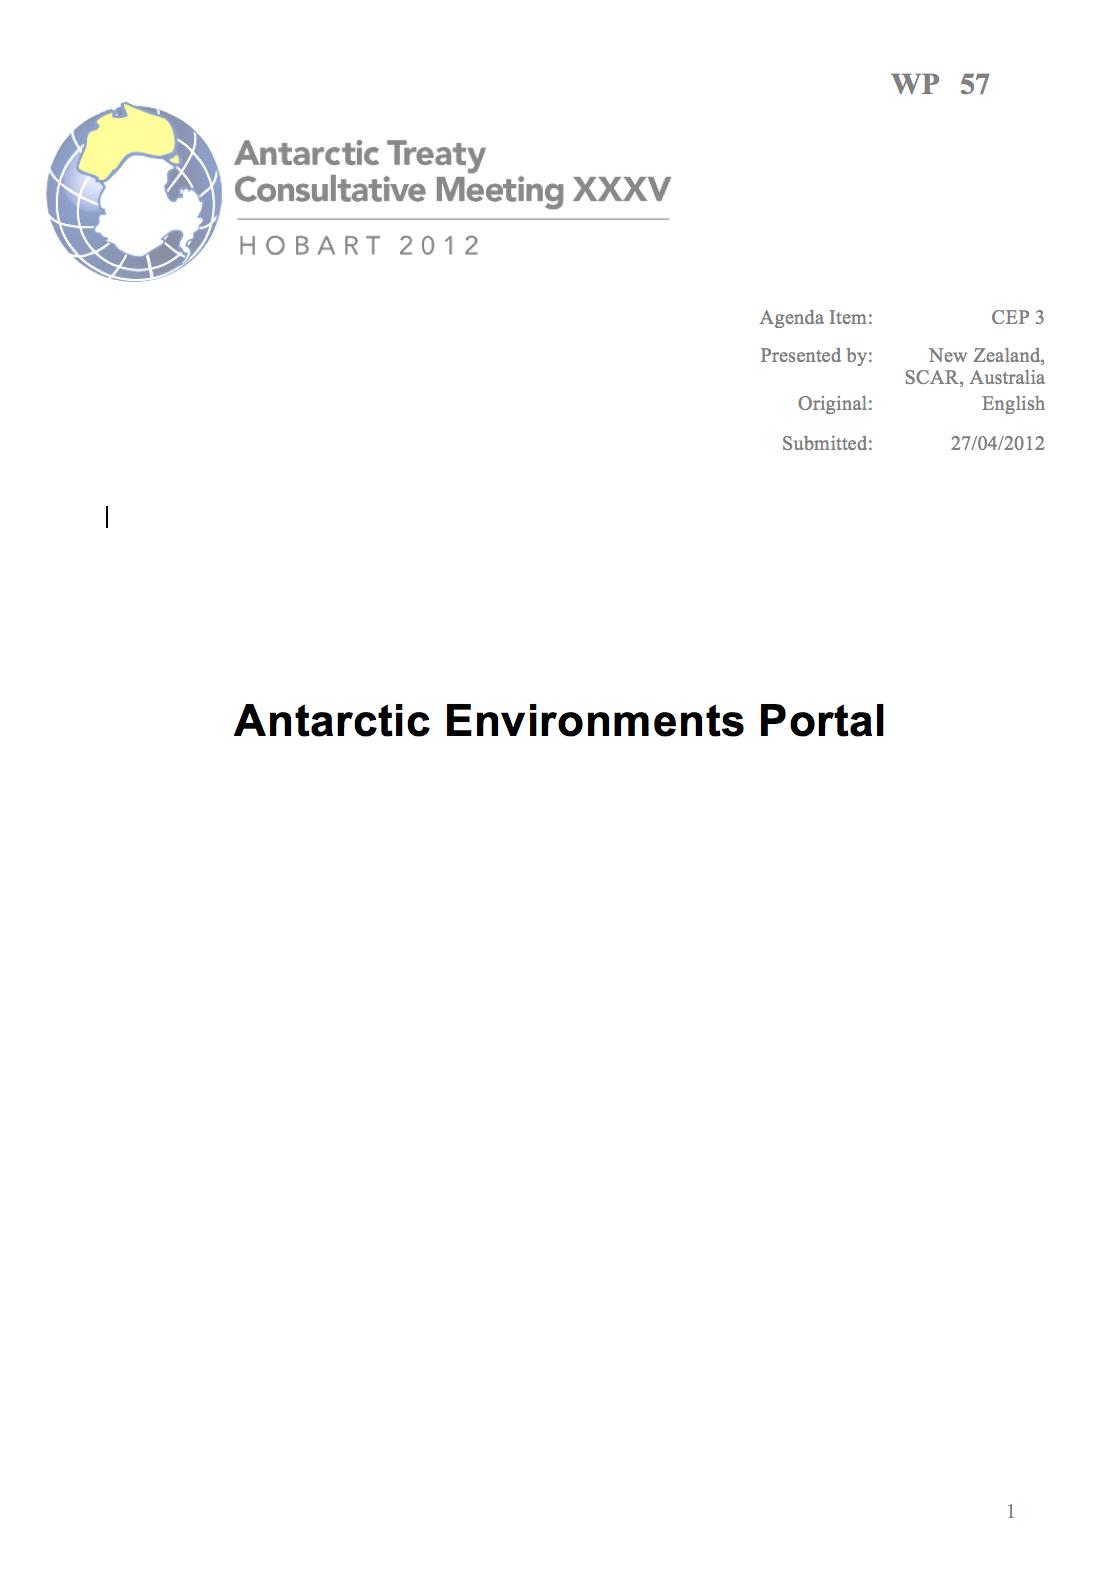 WP057: Antarctic Environments Portal